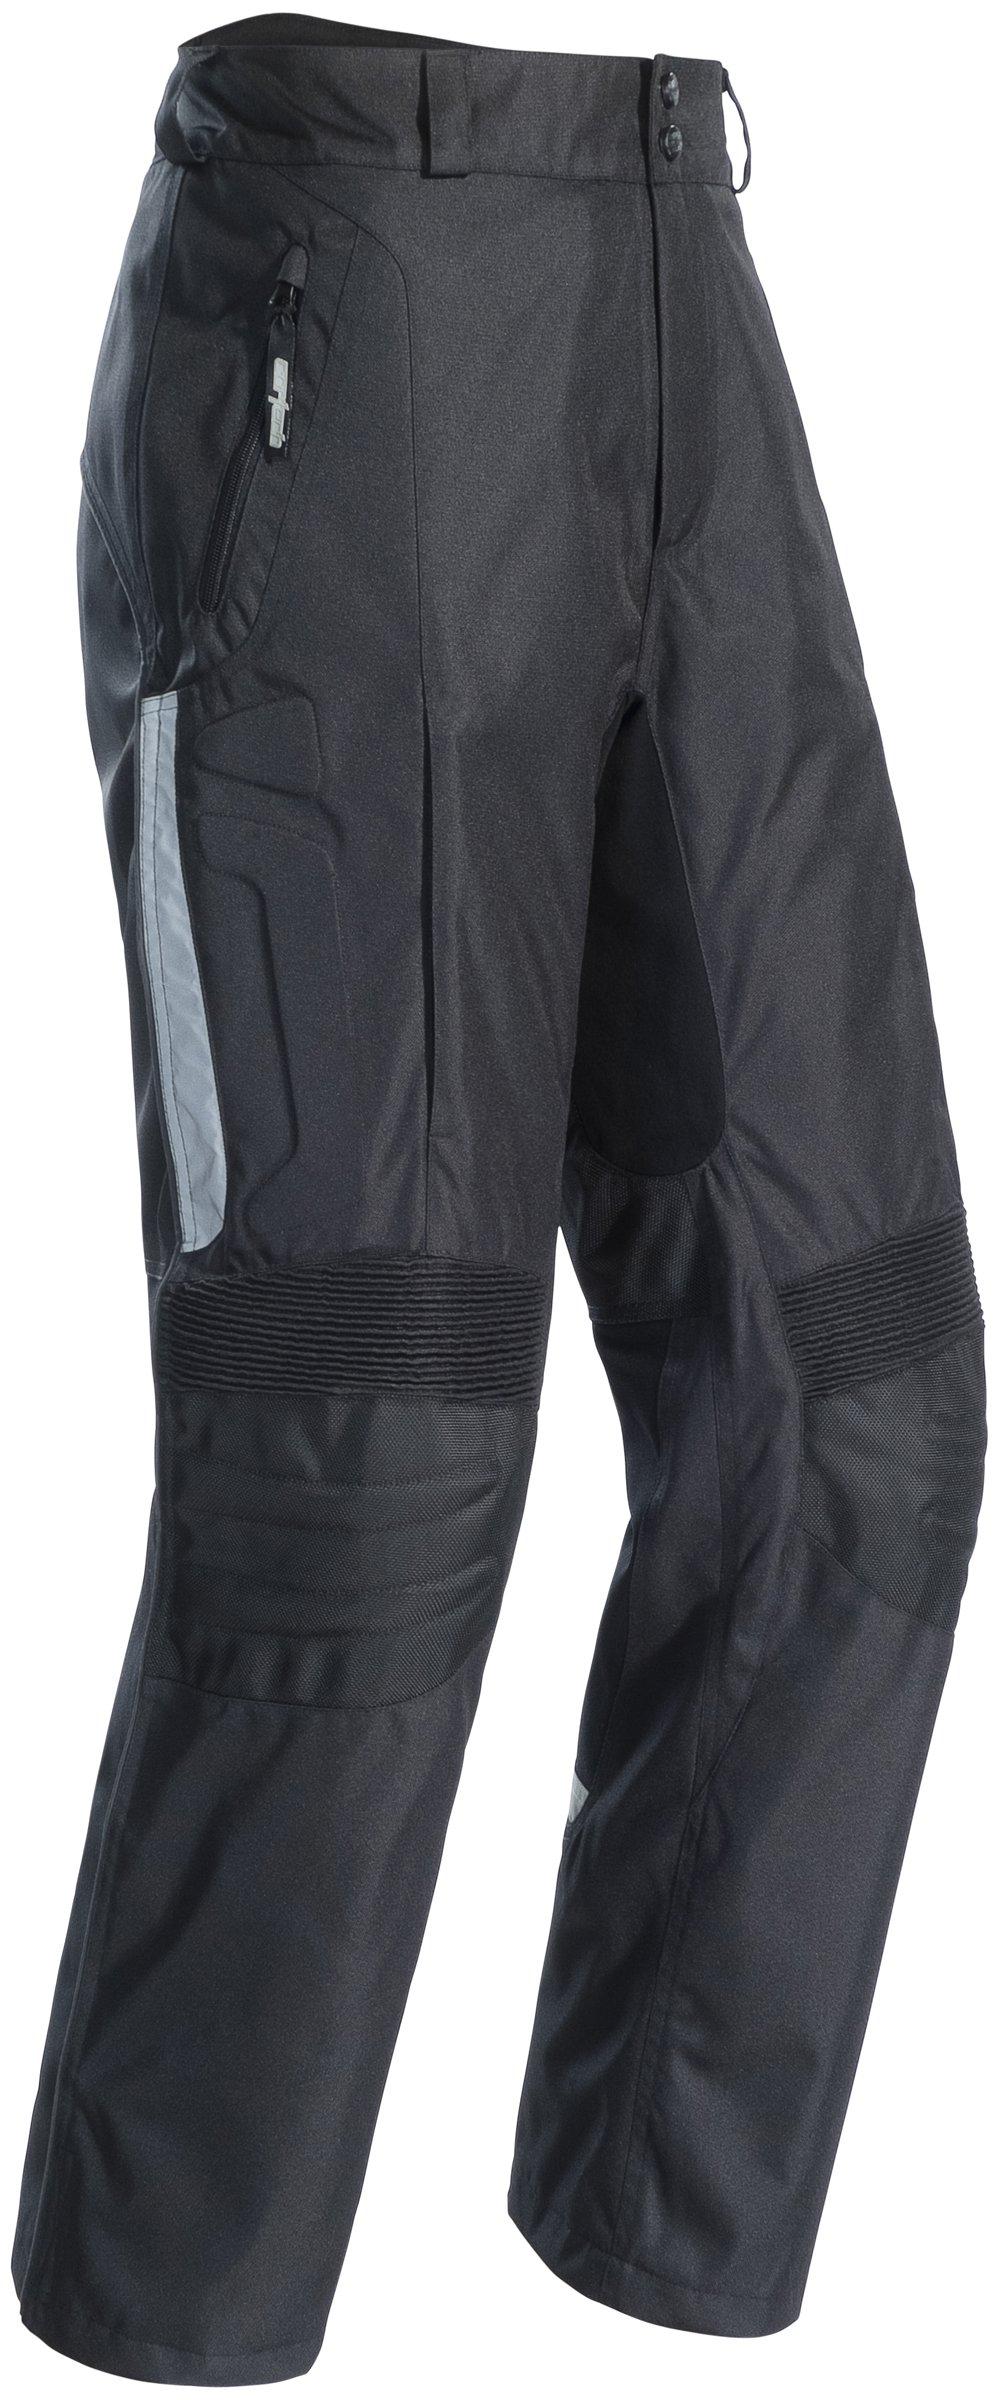 Cortech GX Sport Pants - Medium/Black